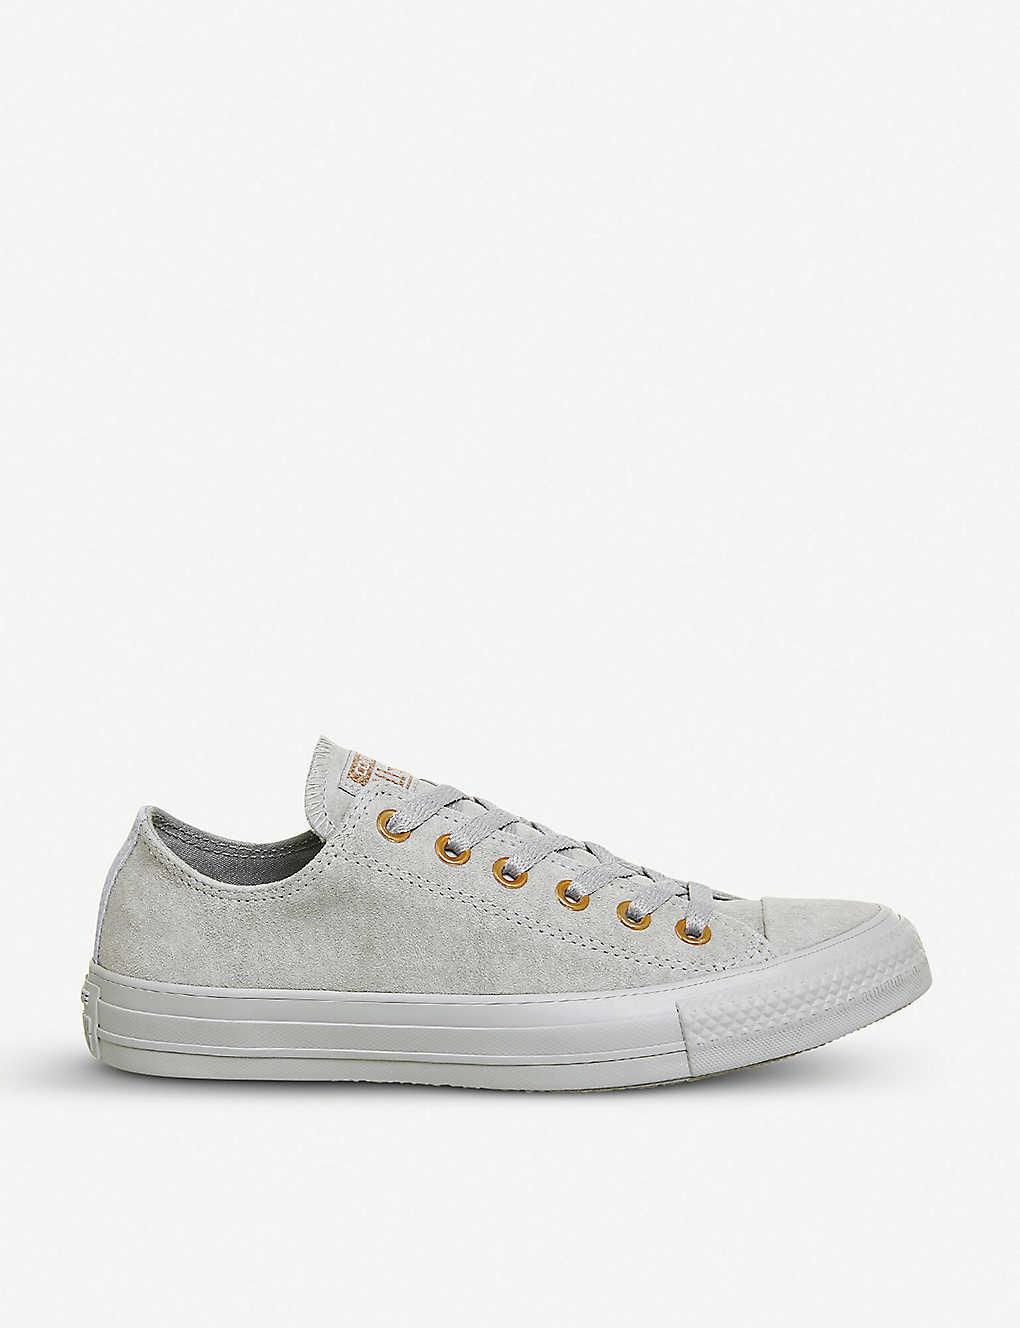 393e59749e22 CONVERSE - Allstar low-top leather trainers